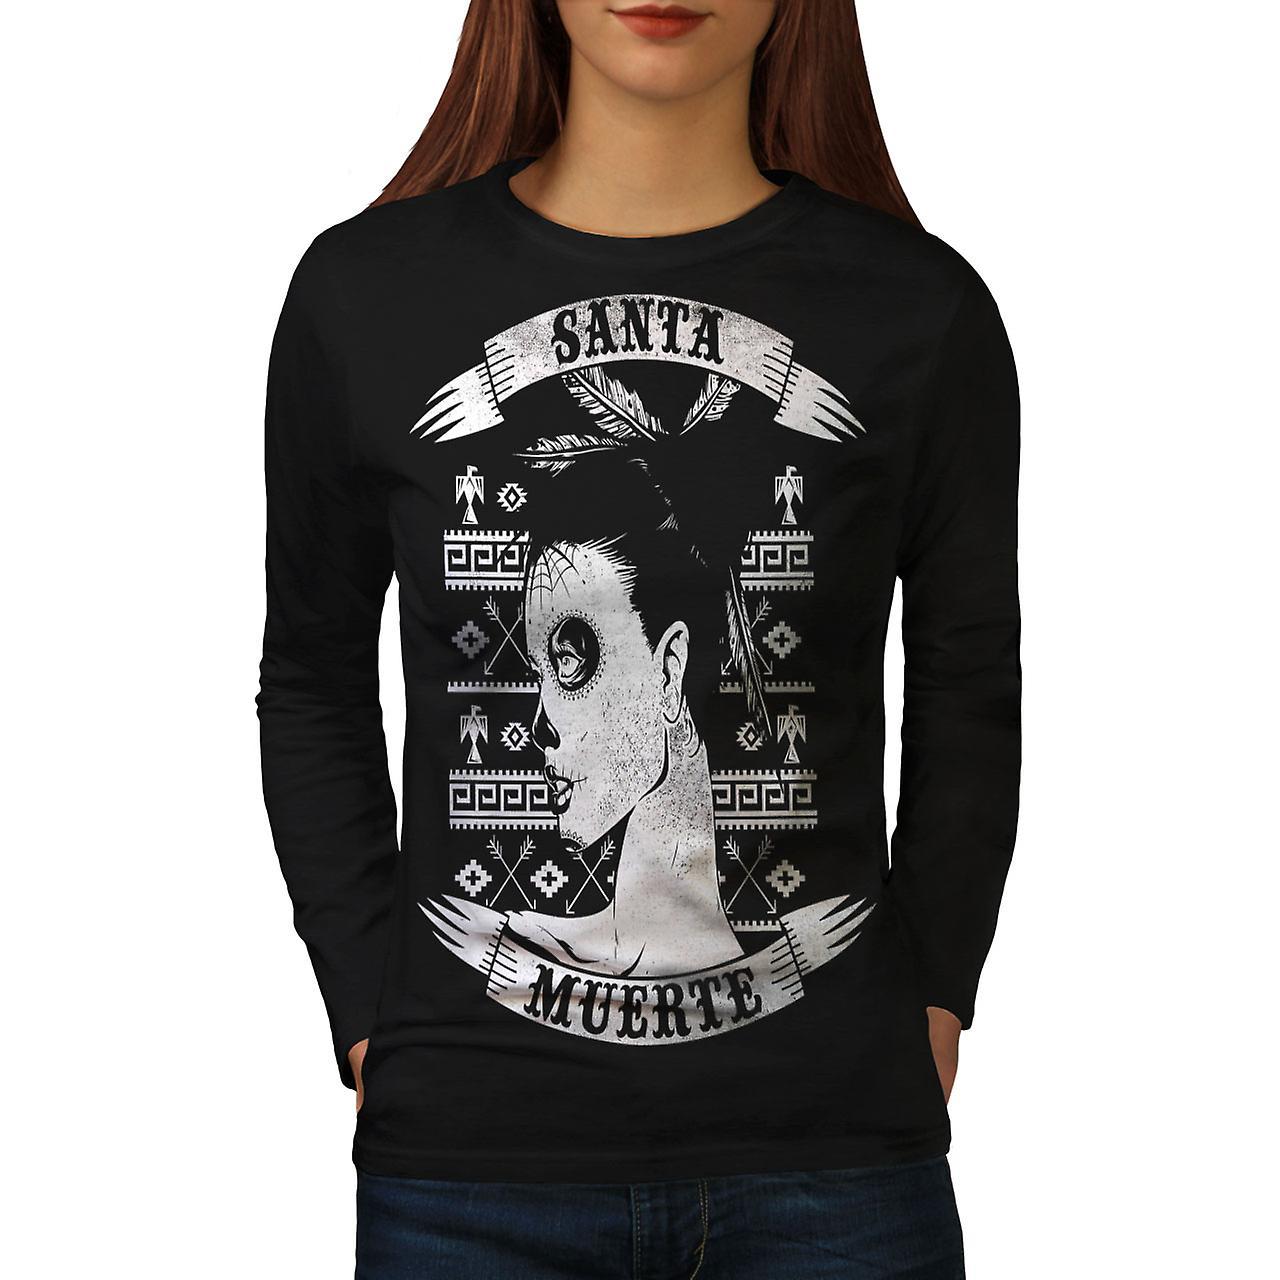 Santa Muerte femme morte Vintage Black T-shirt manches longues | Wellcoda